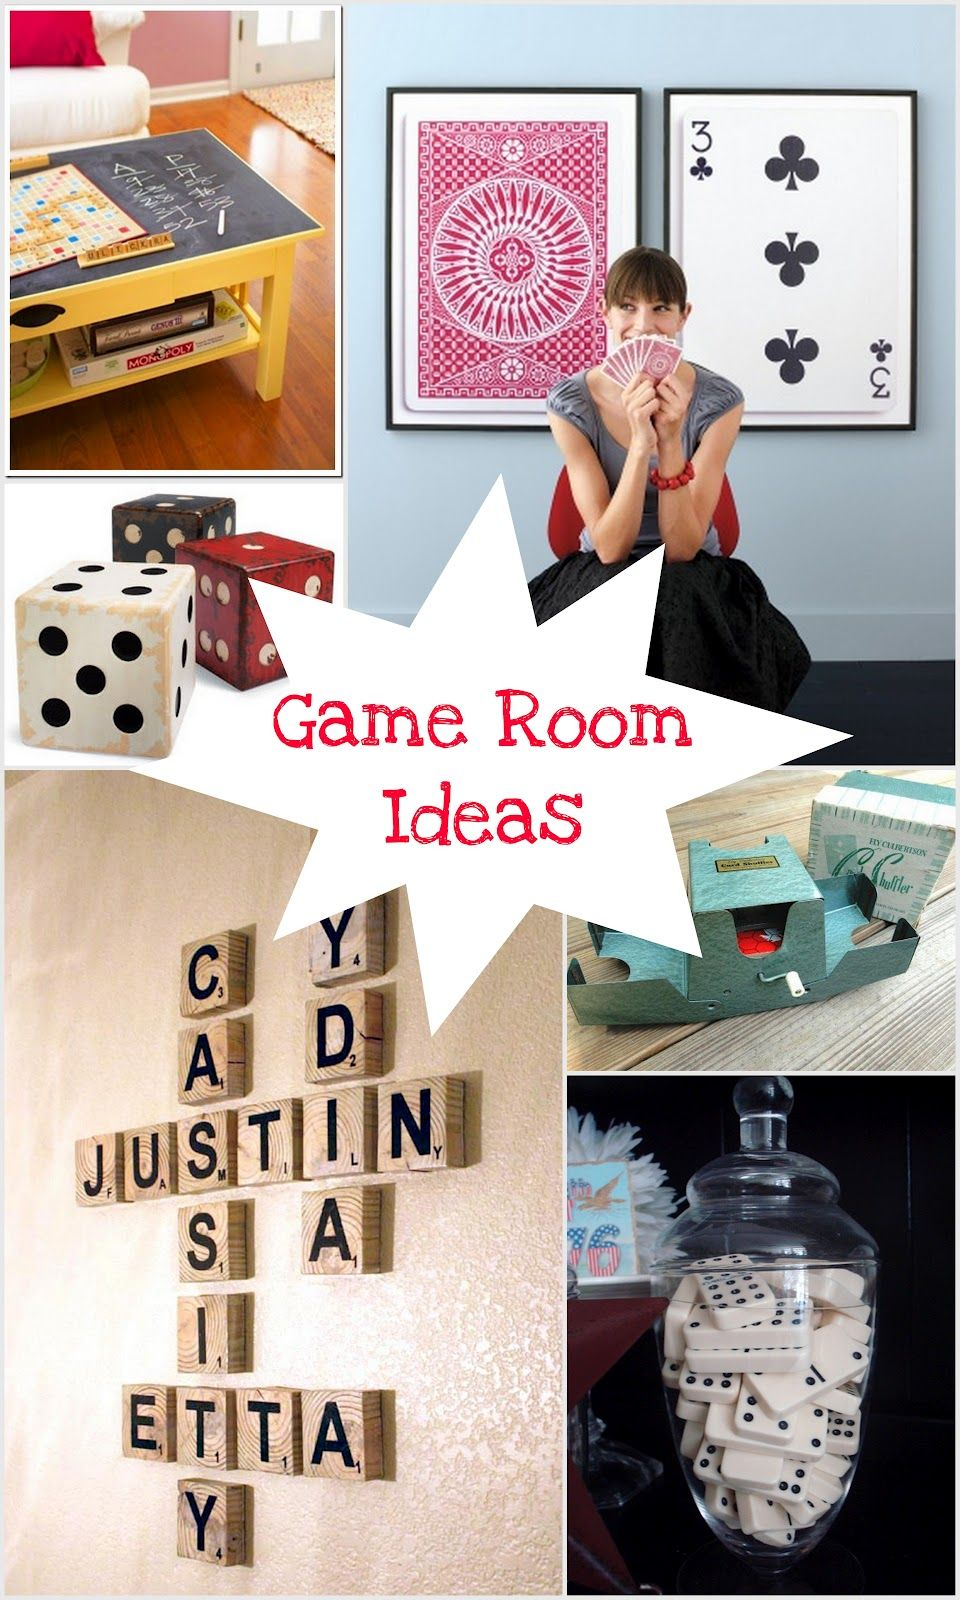 Game room ideas epinkflour i want to do scrabble tiles